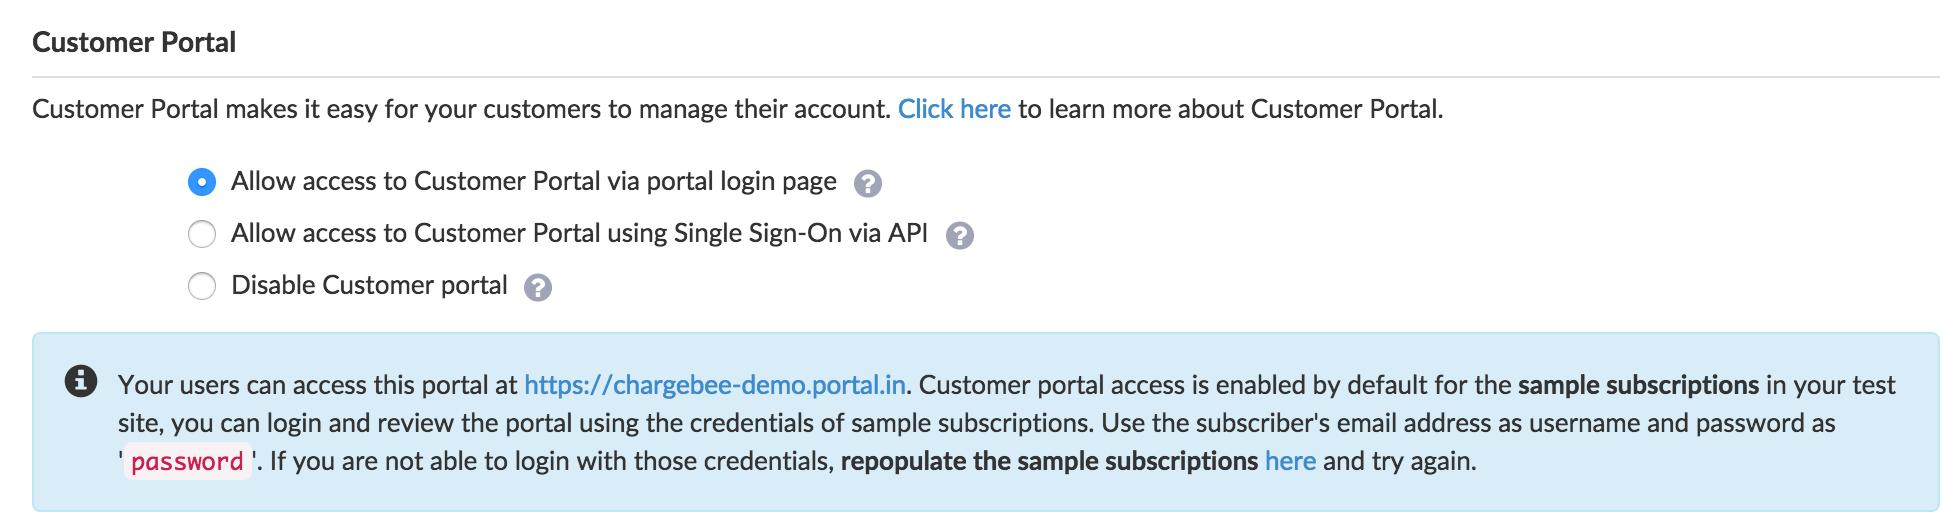 Customer Portal Self Service Portal Chargebee Docs - Open source invoice management